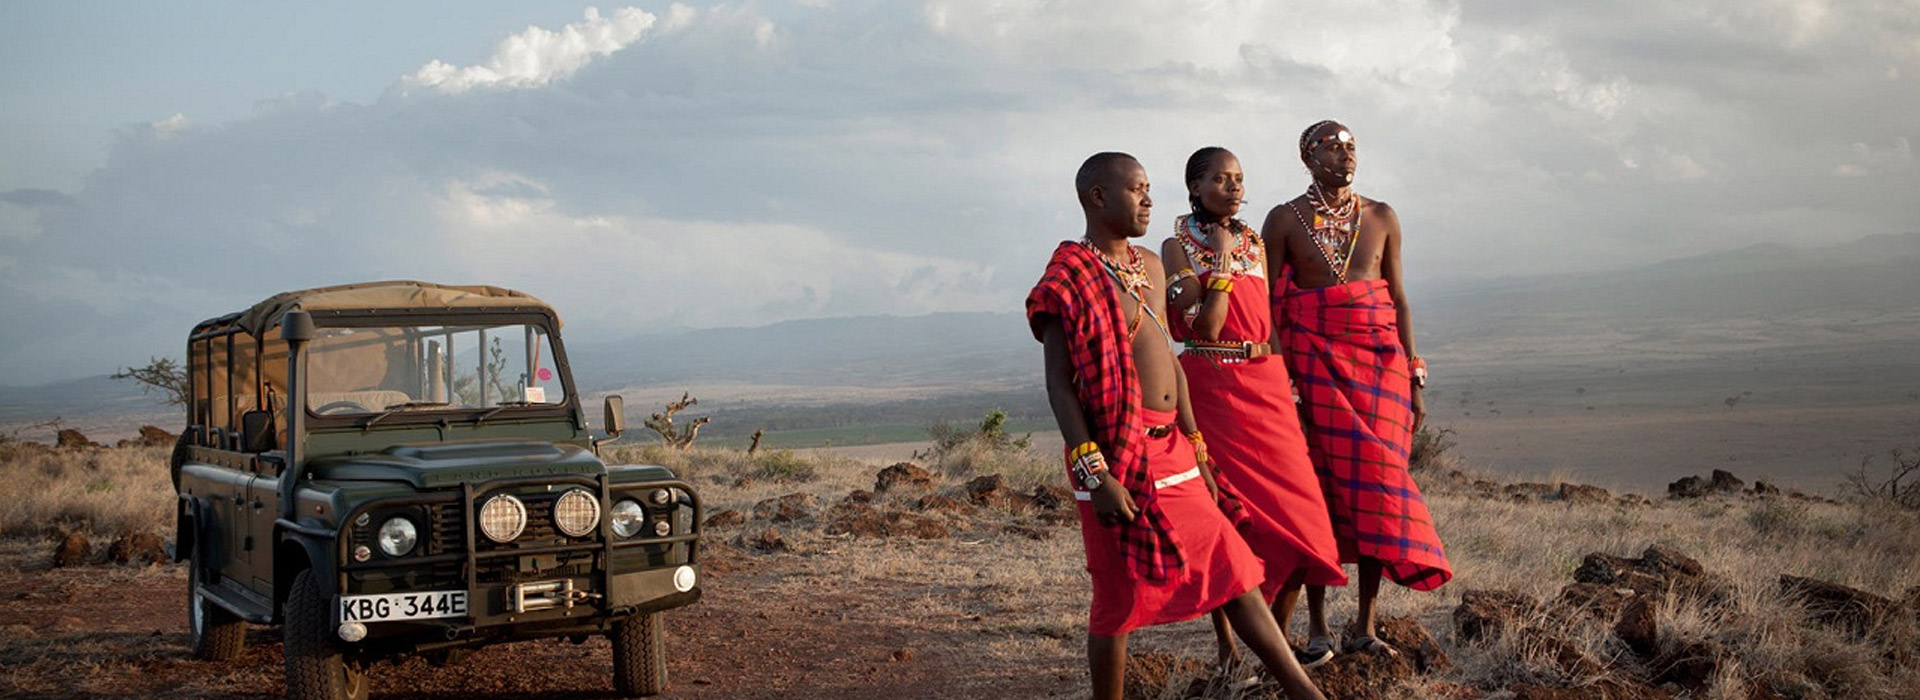 Tipping In Kenya Safari